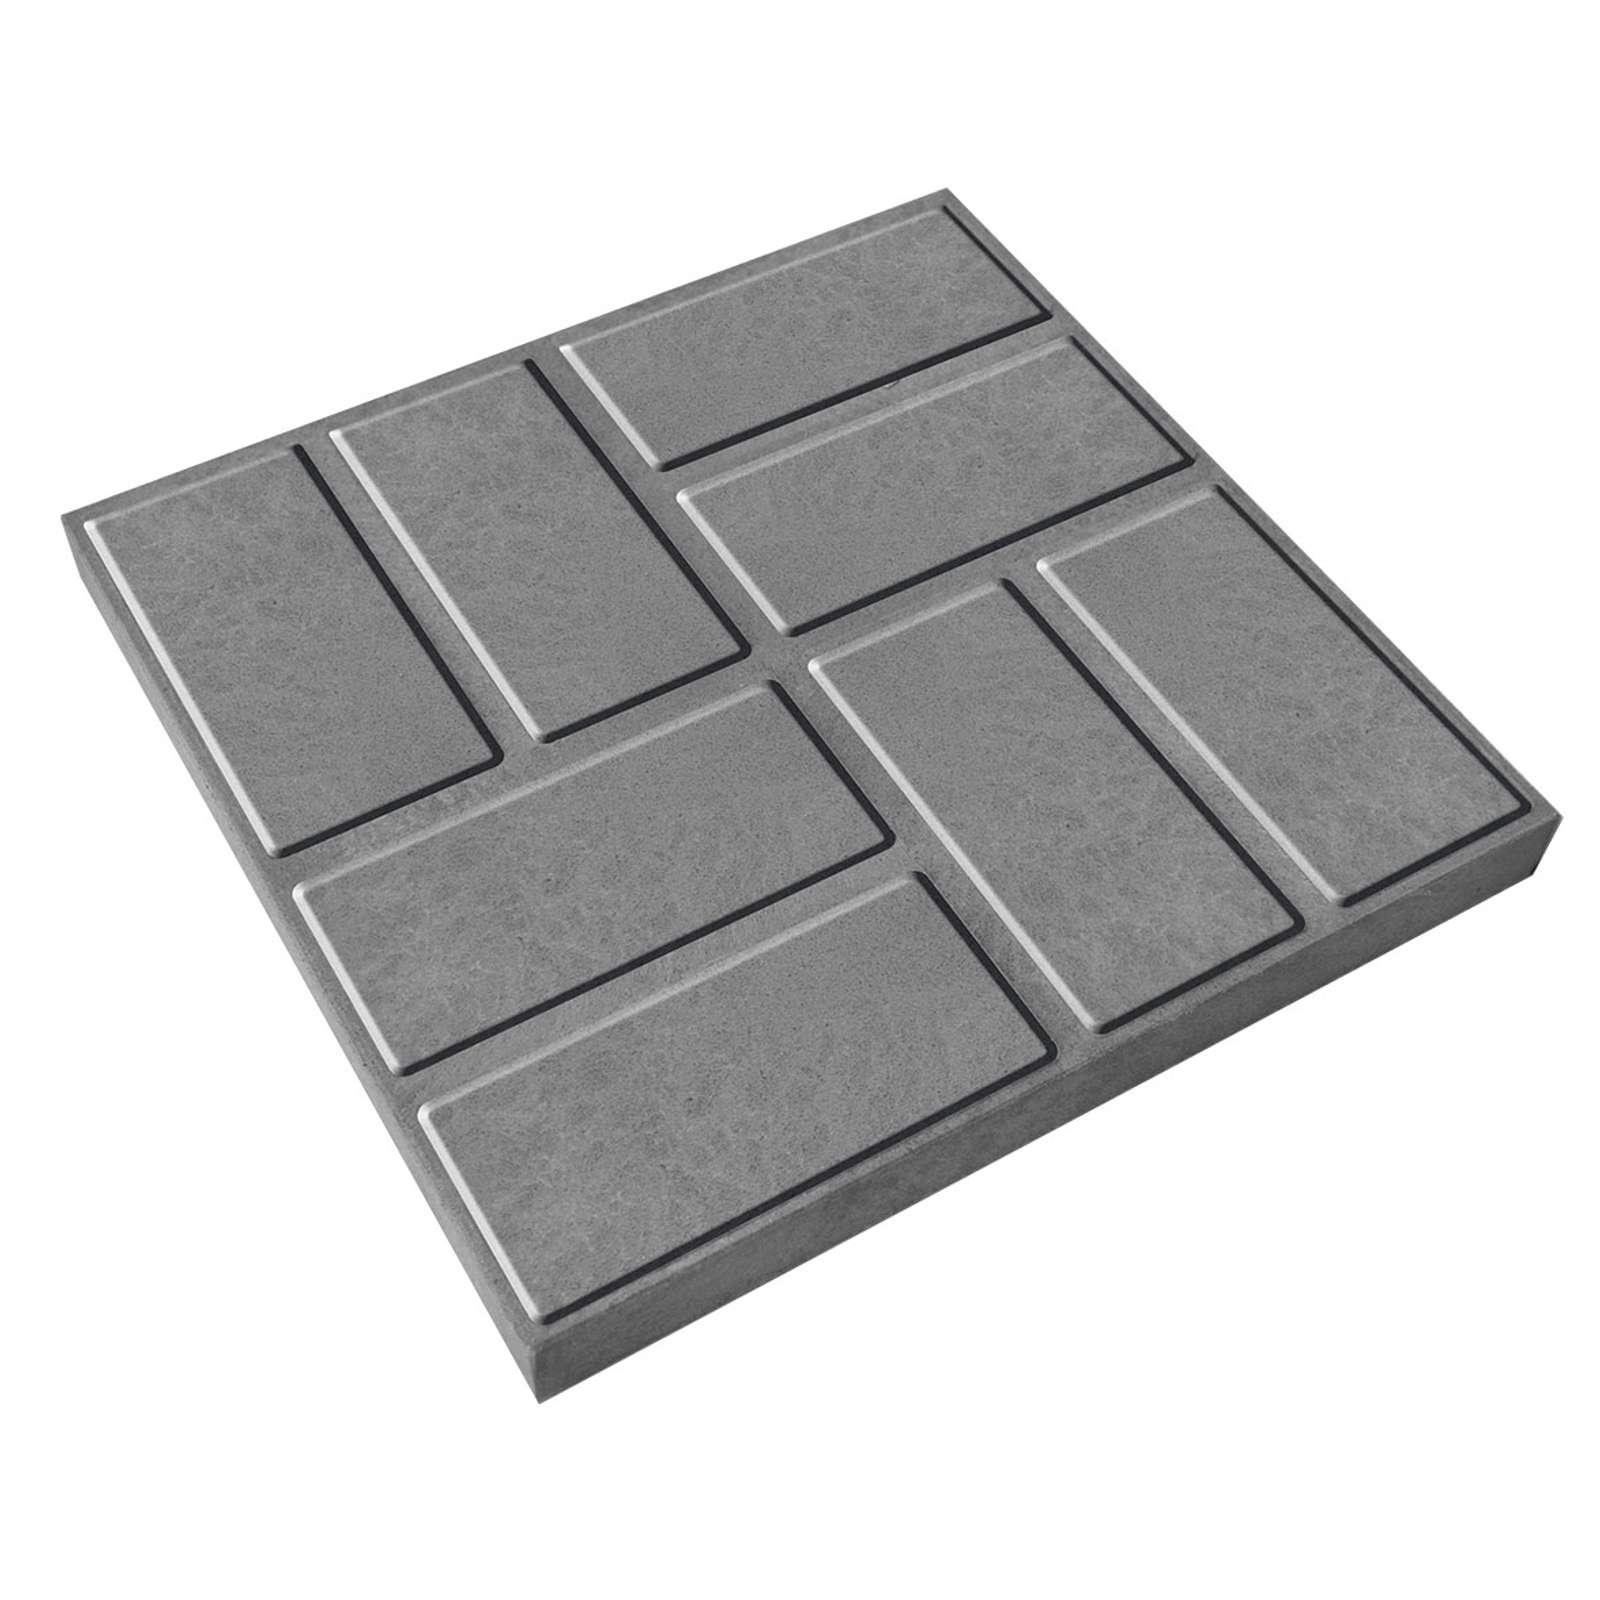 Плитка тротуарная полимерпесчаная 330х330х20 мм серая